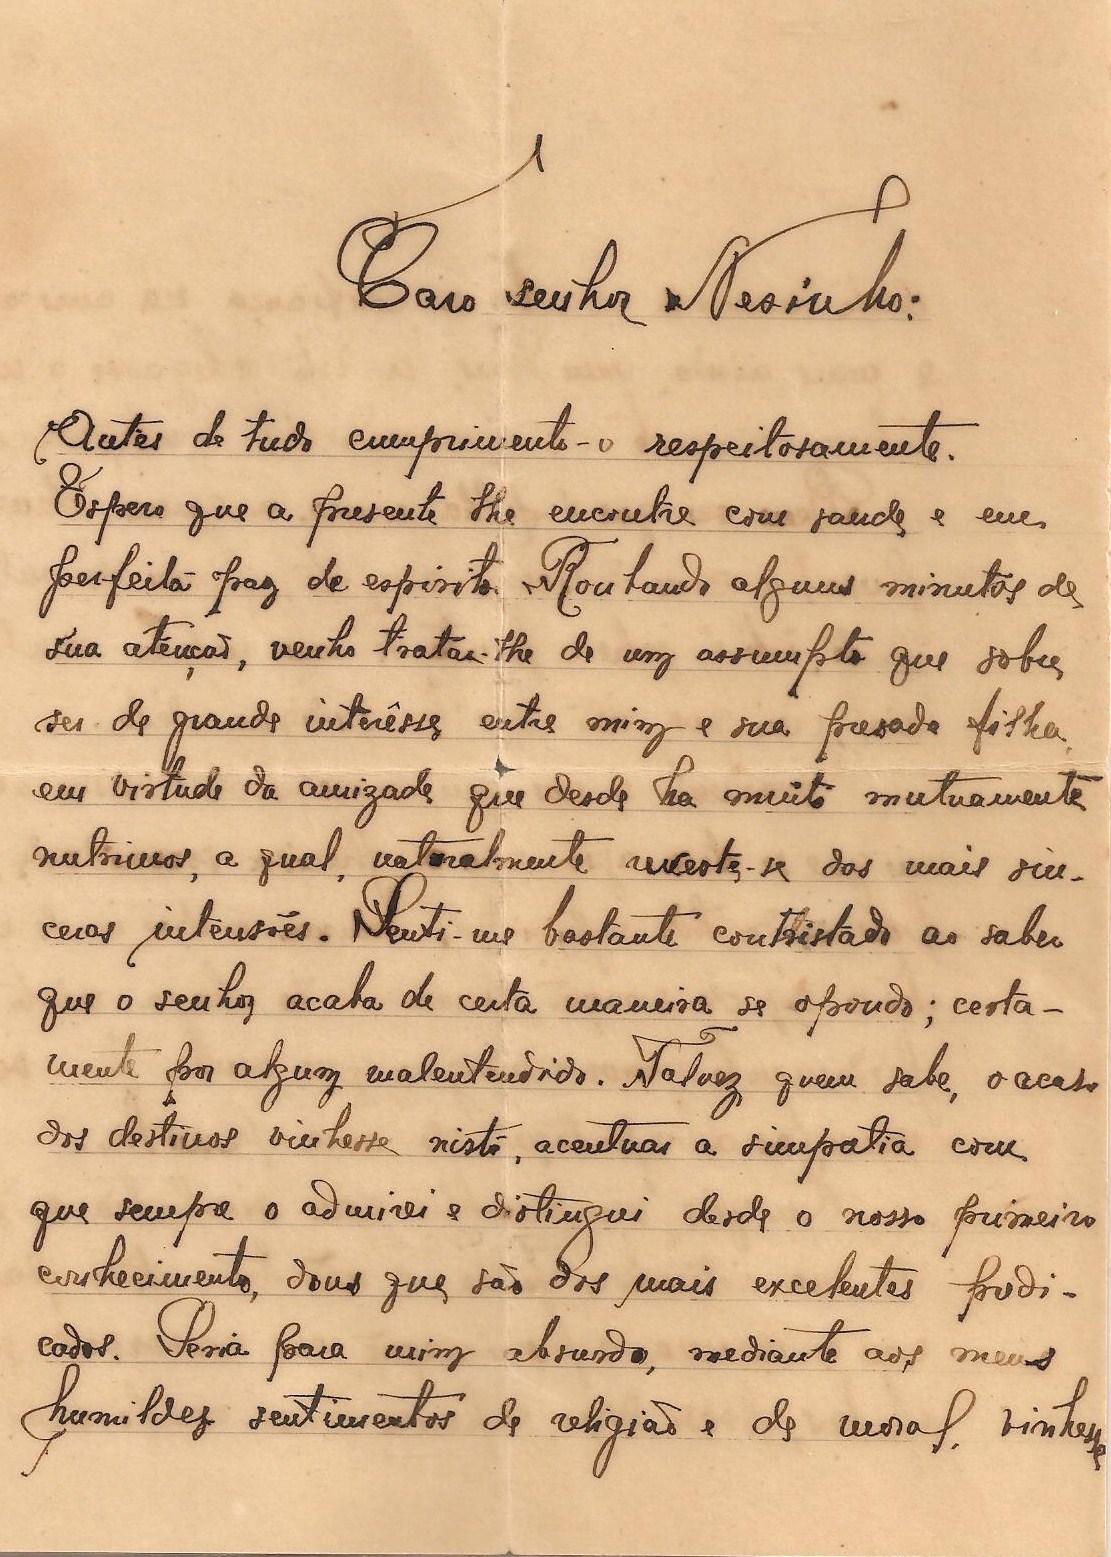 Jijo Wilian Mendes Ramos: Carta de Pedido de Noivado - Angola